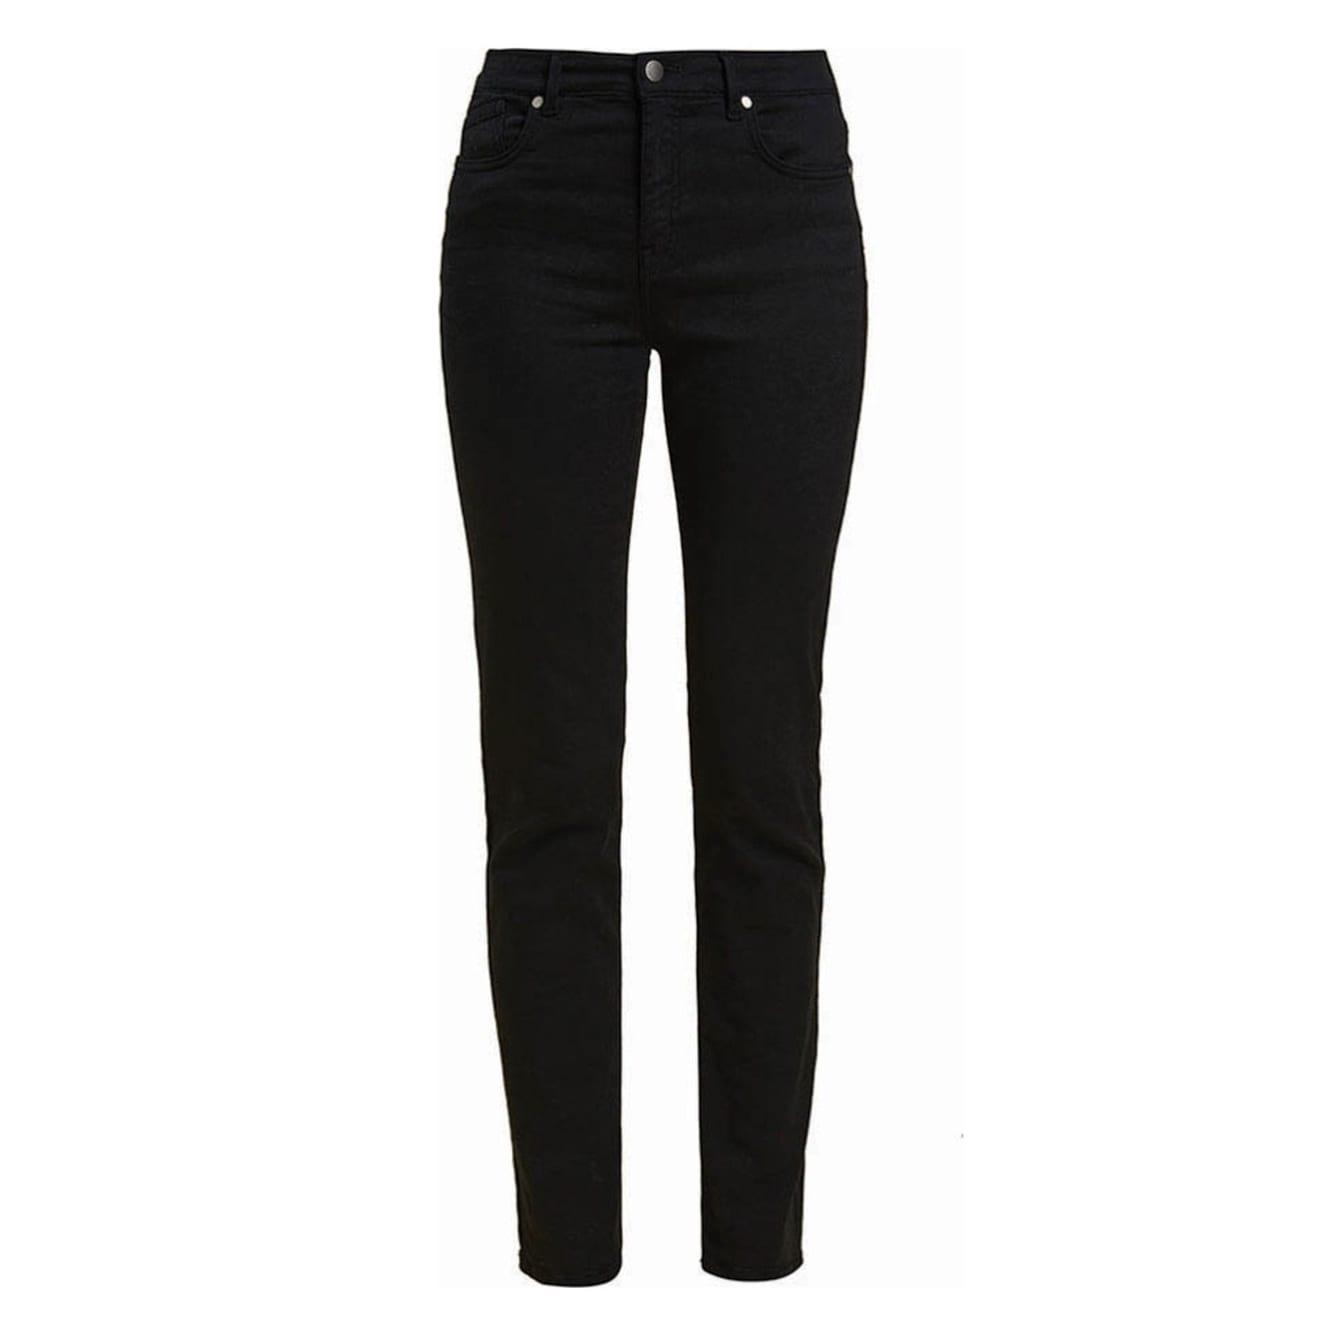 Barbour Womens Slim Fit Jeans Black